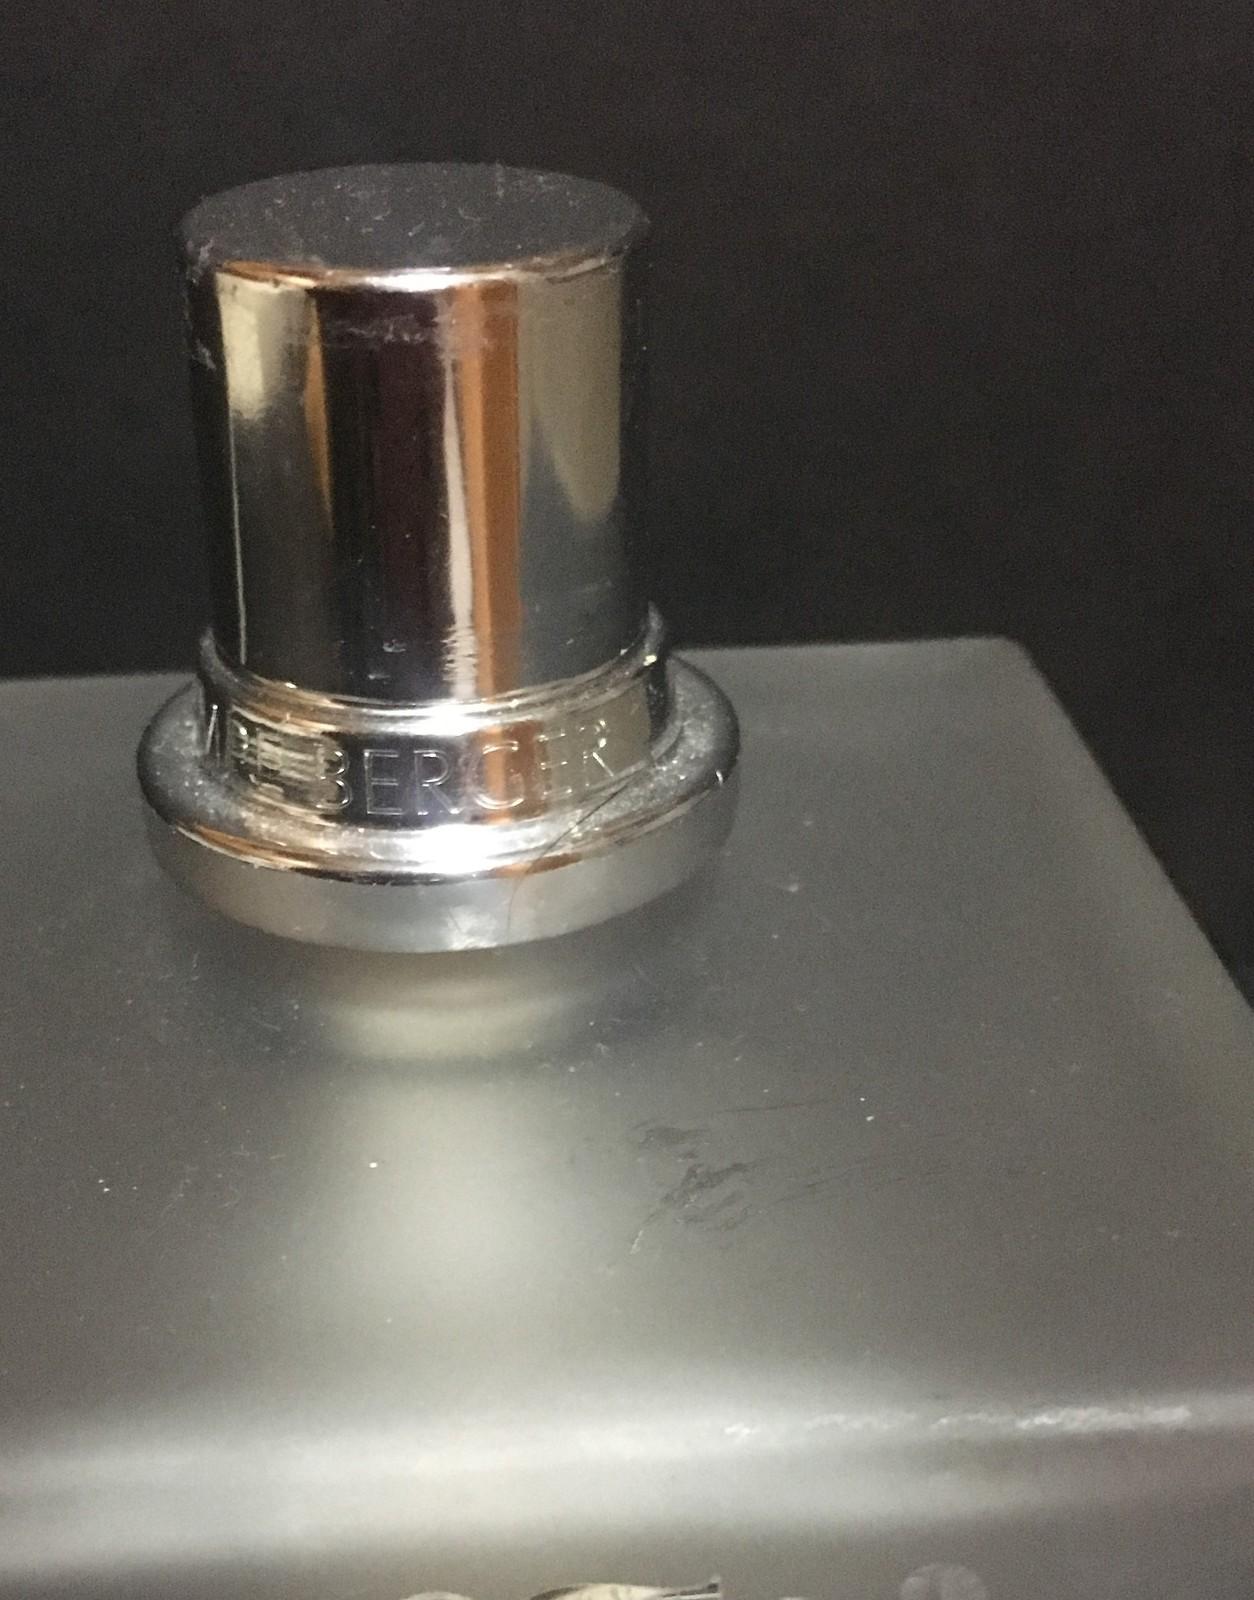 Lampe Berger Catalytic Fragrance Burner Clear Frosted Etched Design Complete